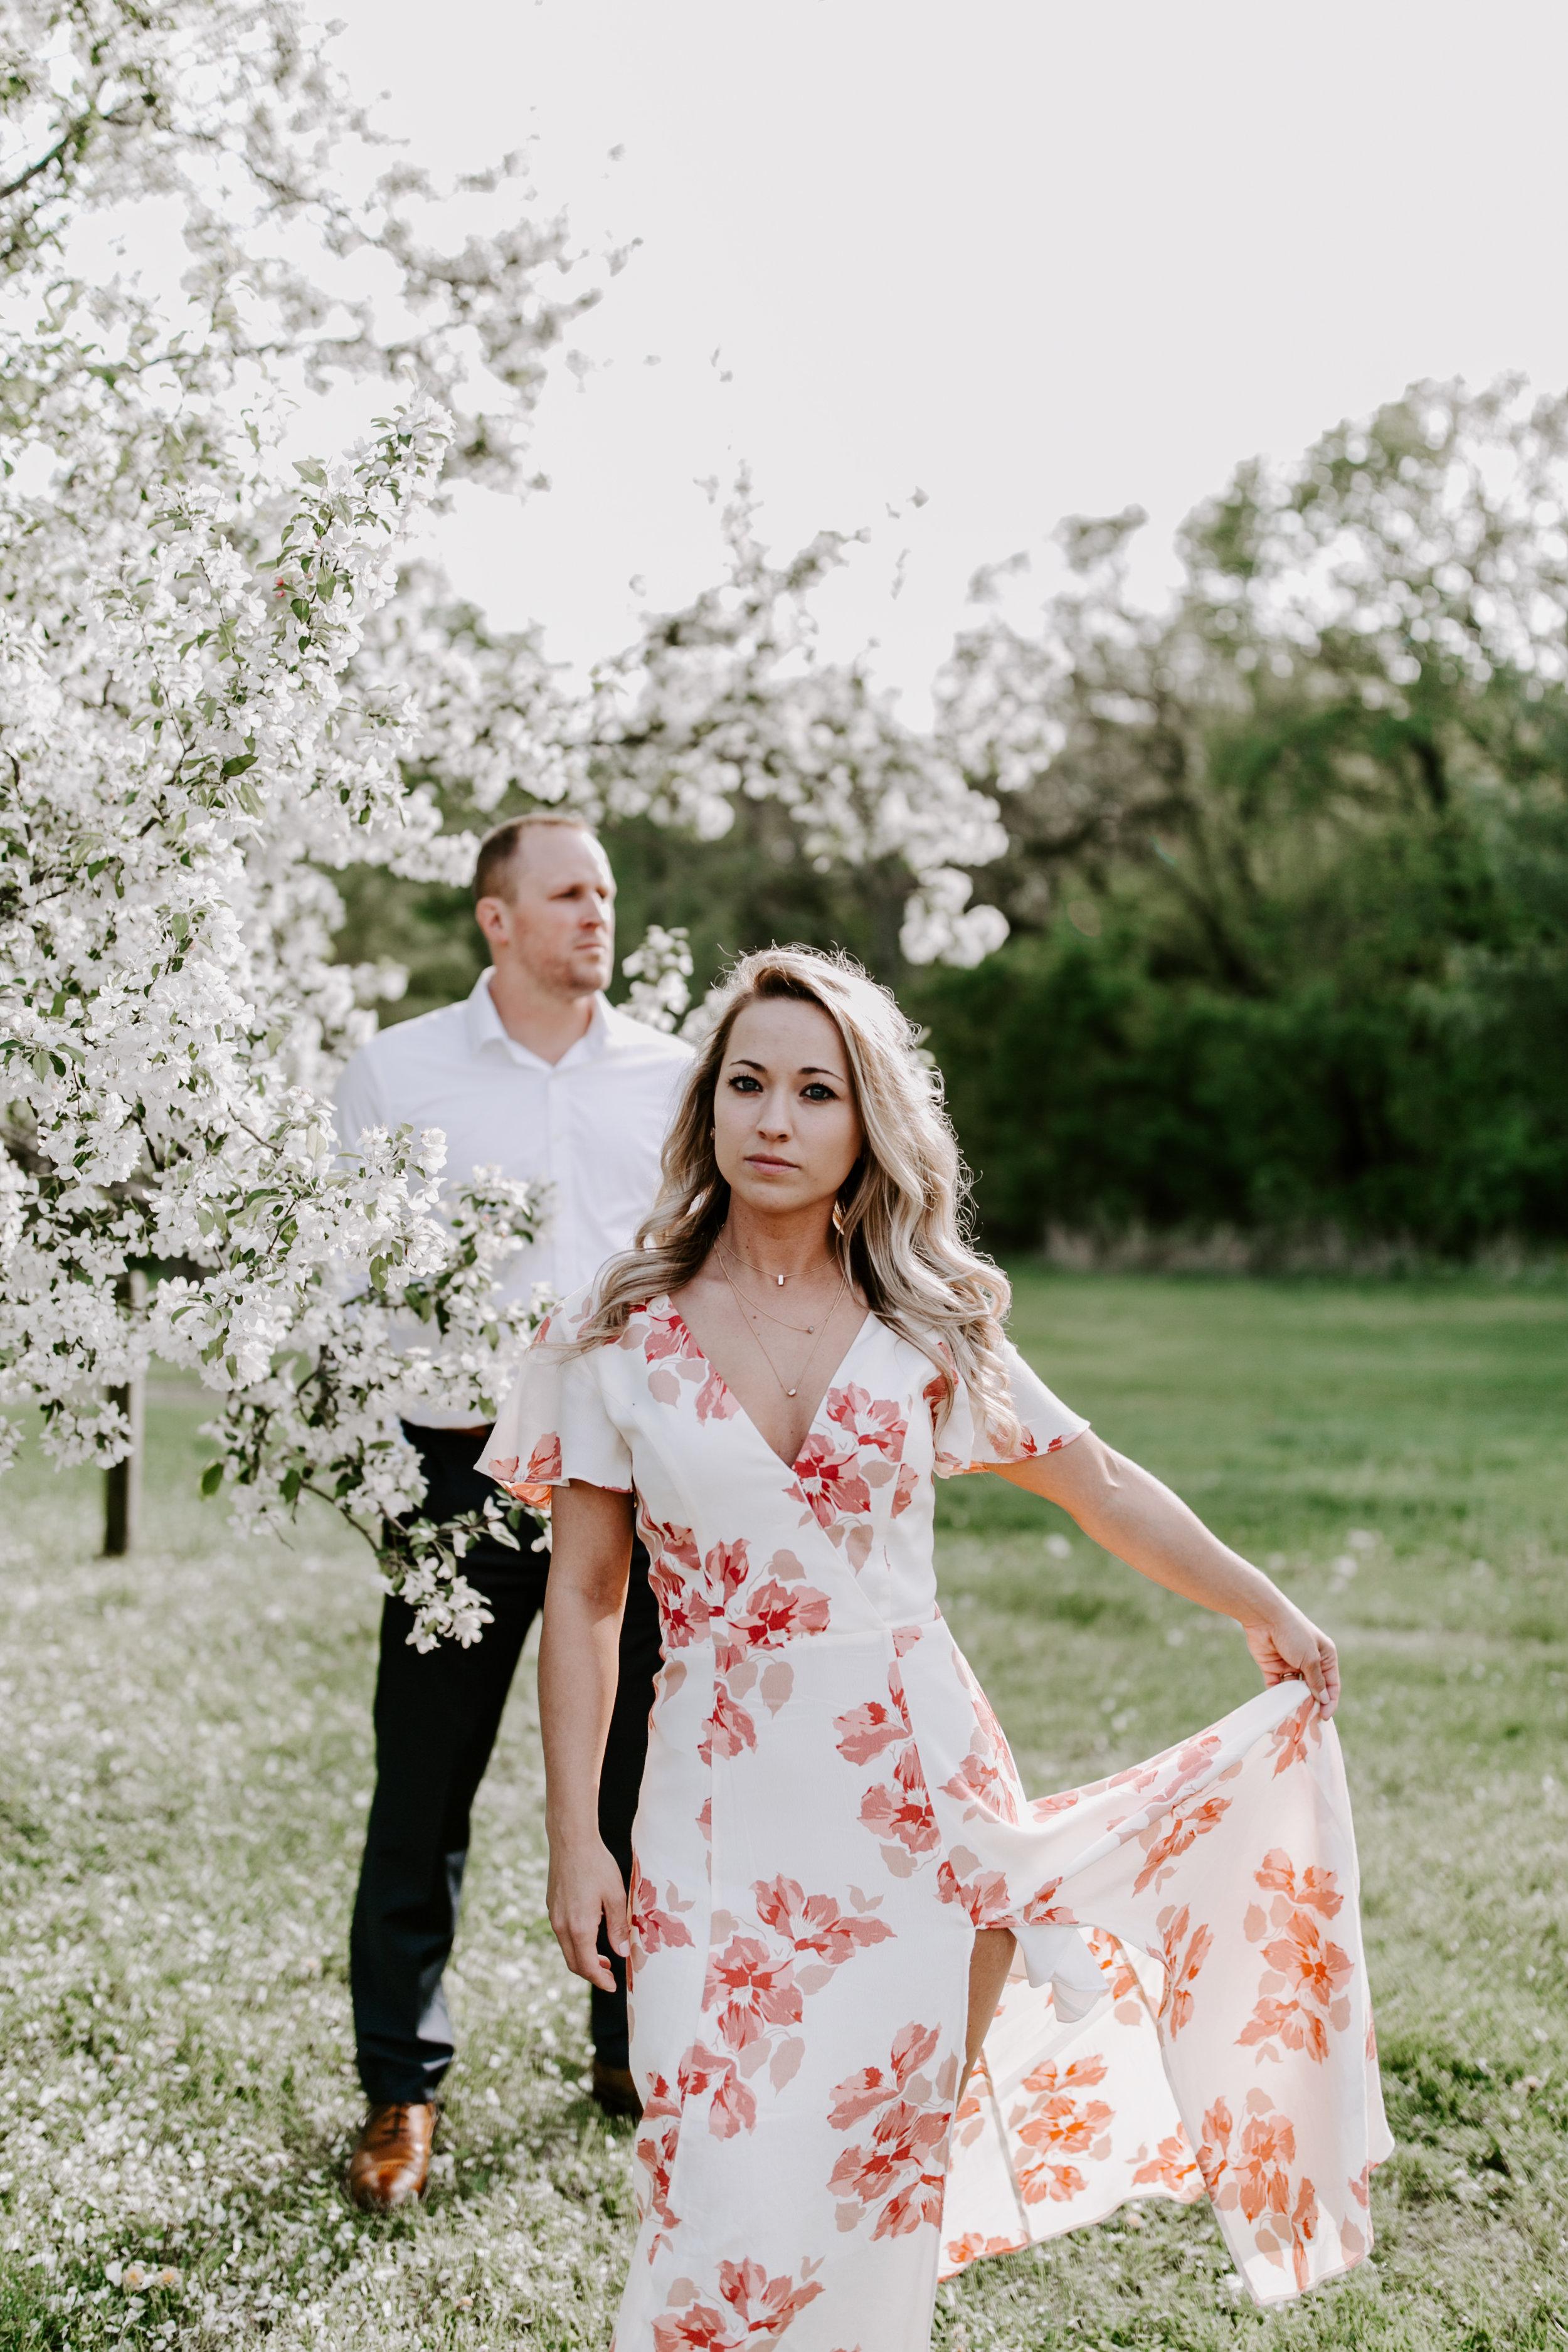 gracetphotography-wedding-photographer-adventure-bride-engagement-midwest-29.jpg